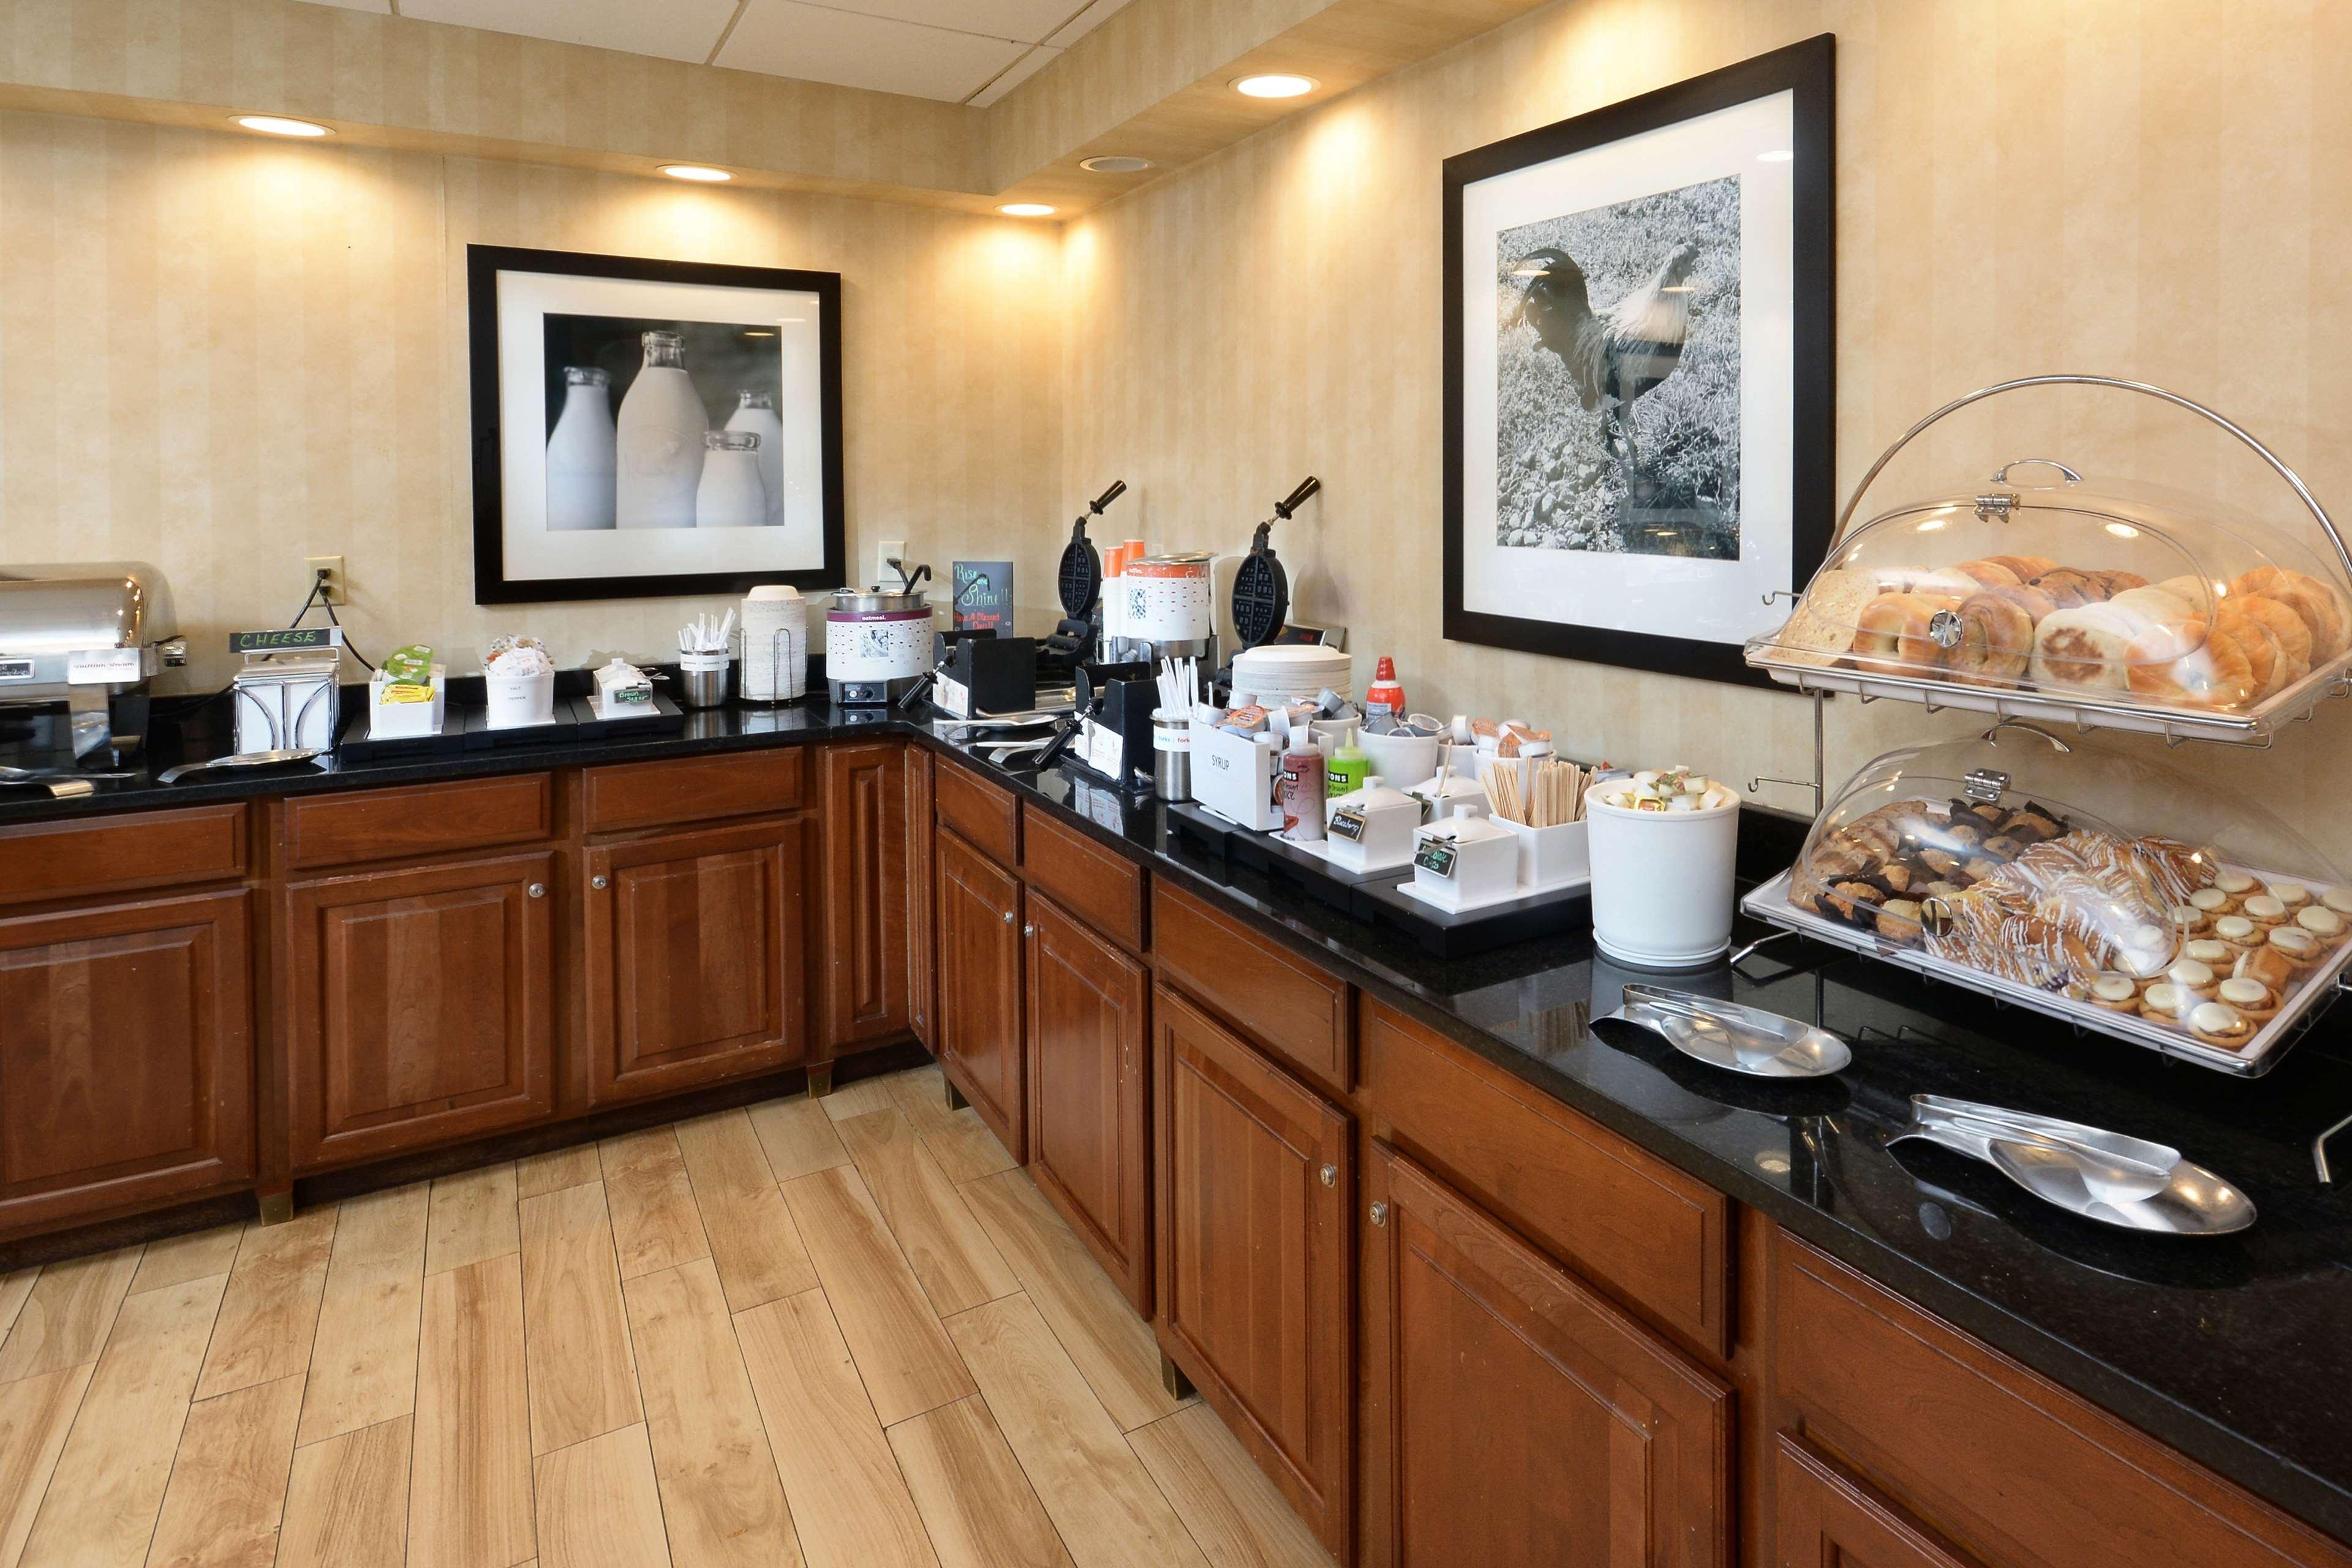 Hampton Inn & Suites Greenville/Spartanburg I-85 image 18